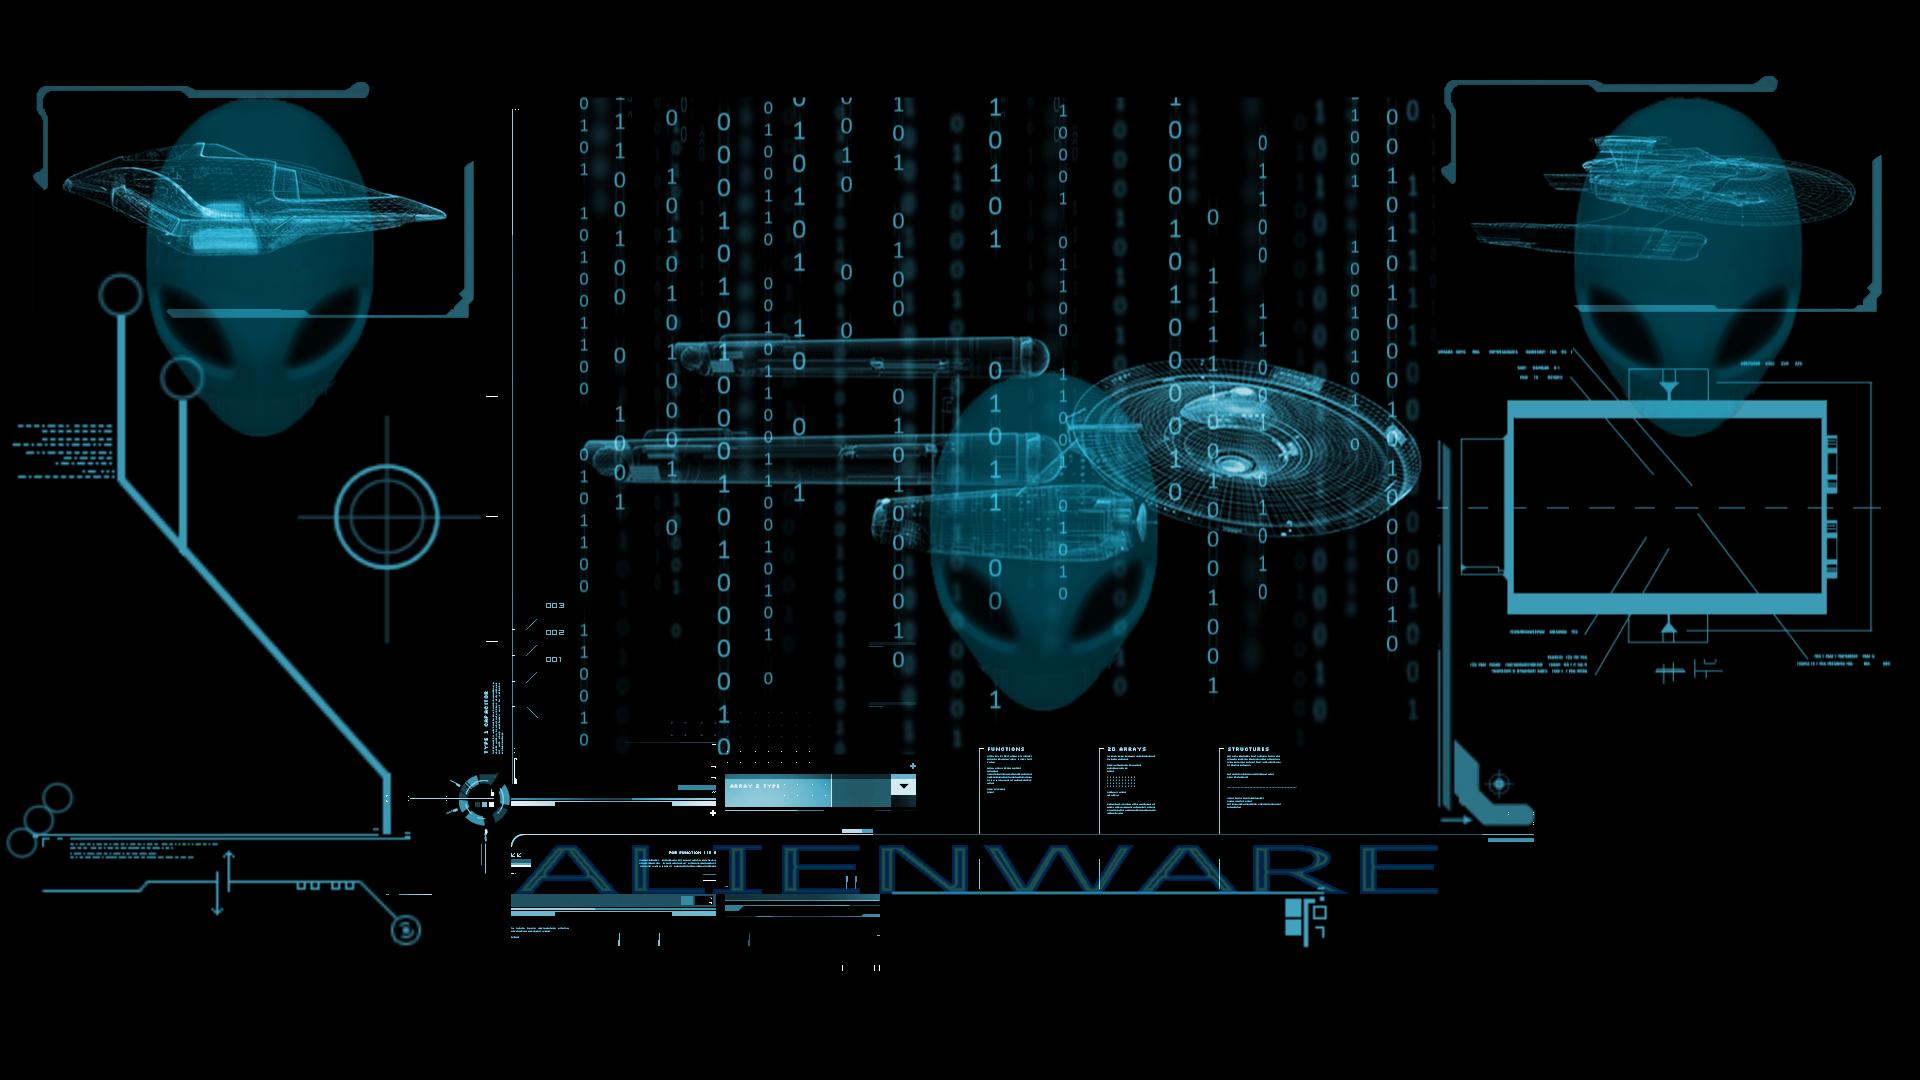 49+ Alienware Wallpaper 72 dpi on WallpaperSafari